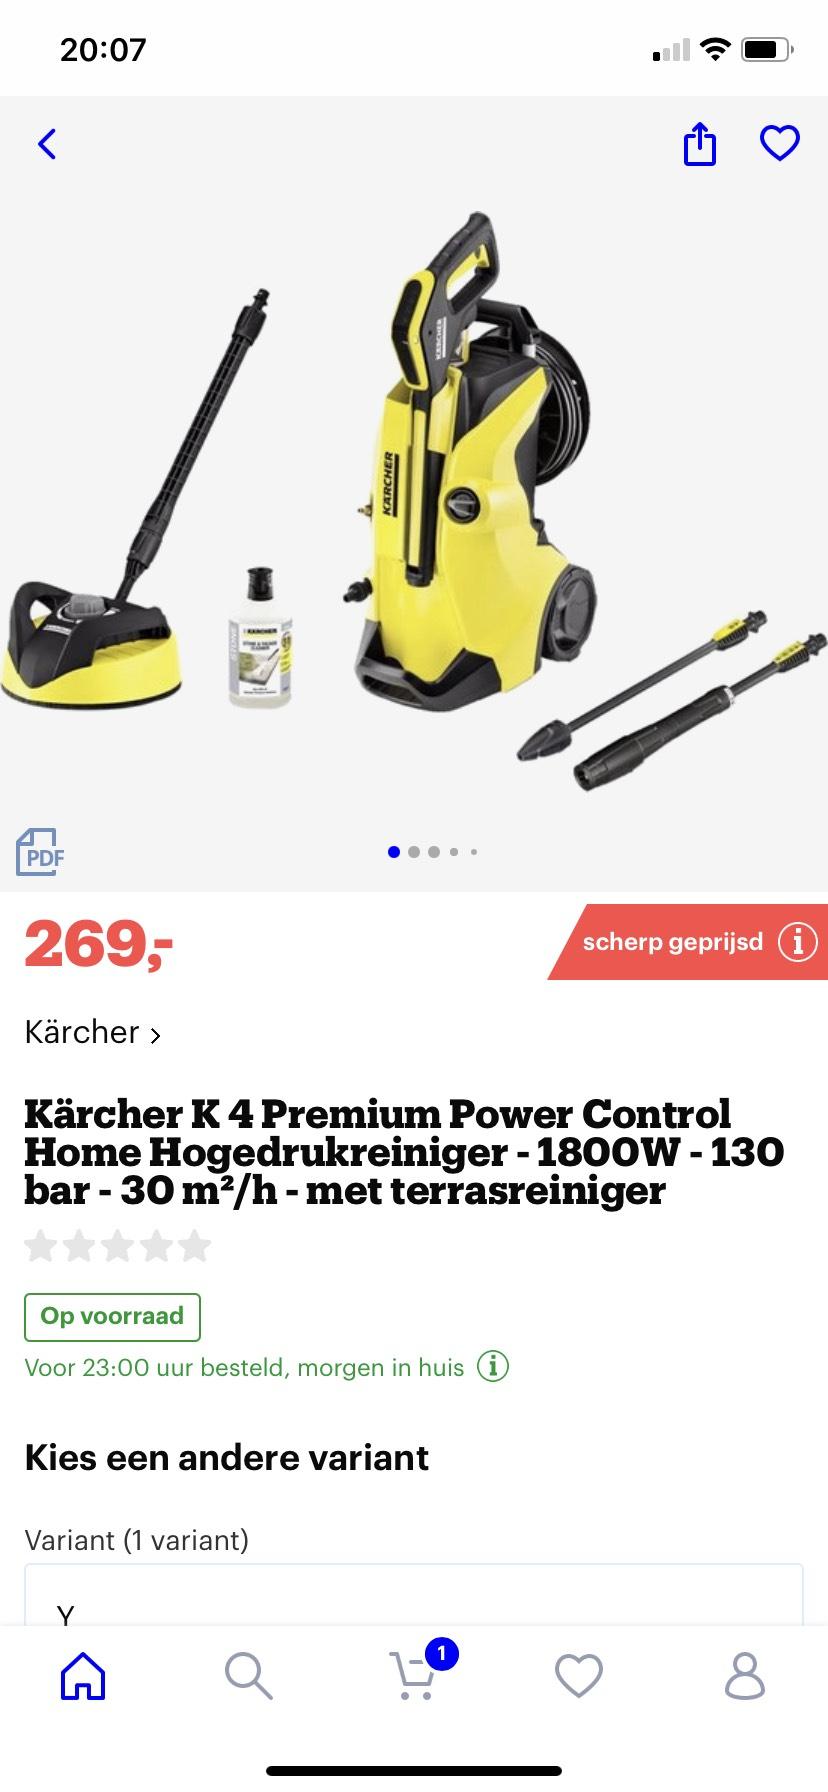 karcher k4 premium power control home